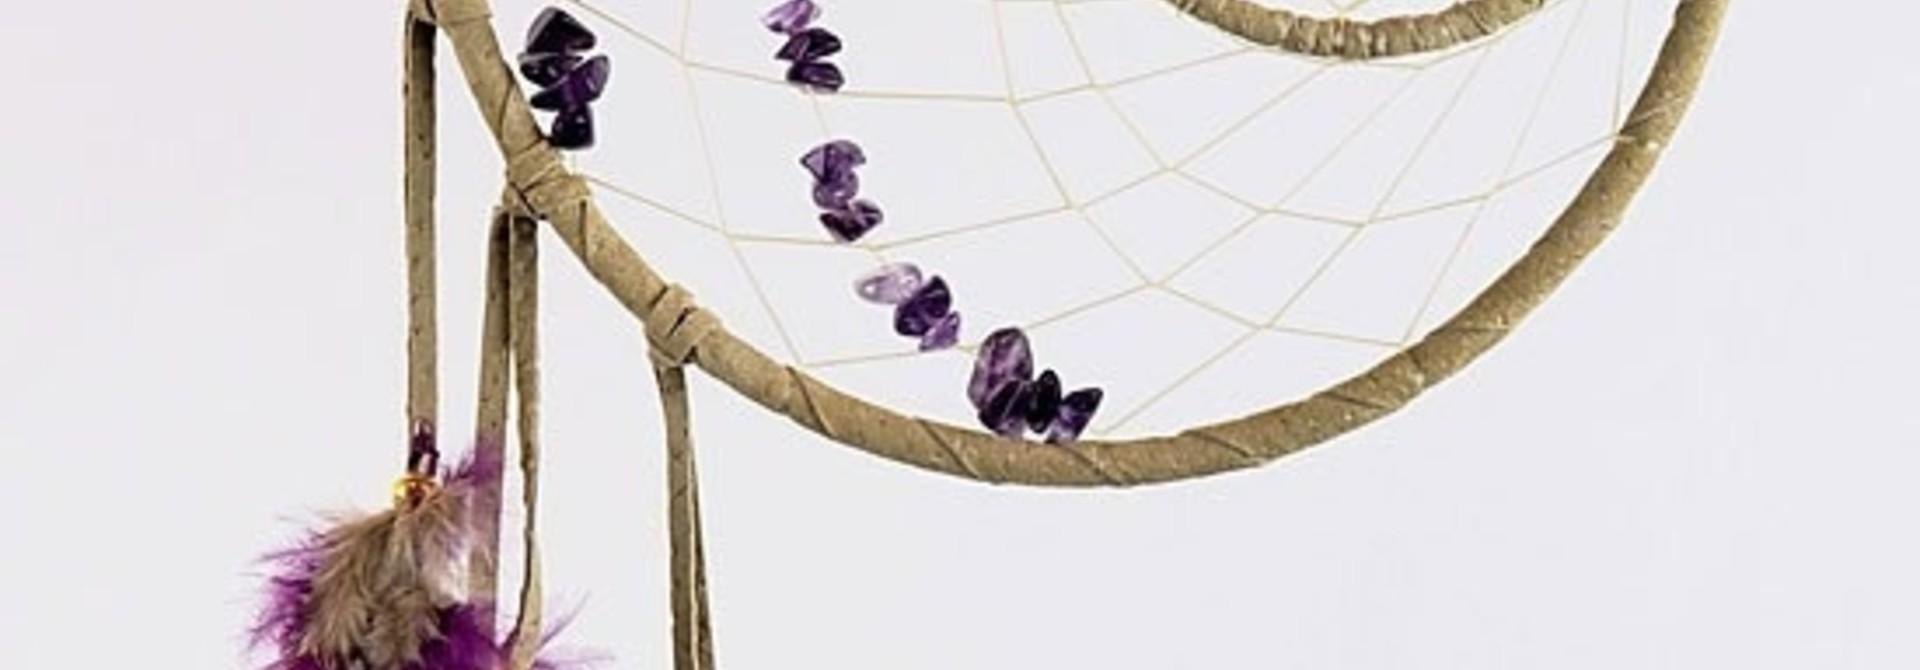 "6"" Energy flow Dream Catcher w Amethyst stones"